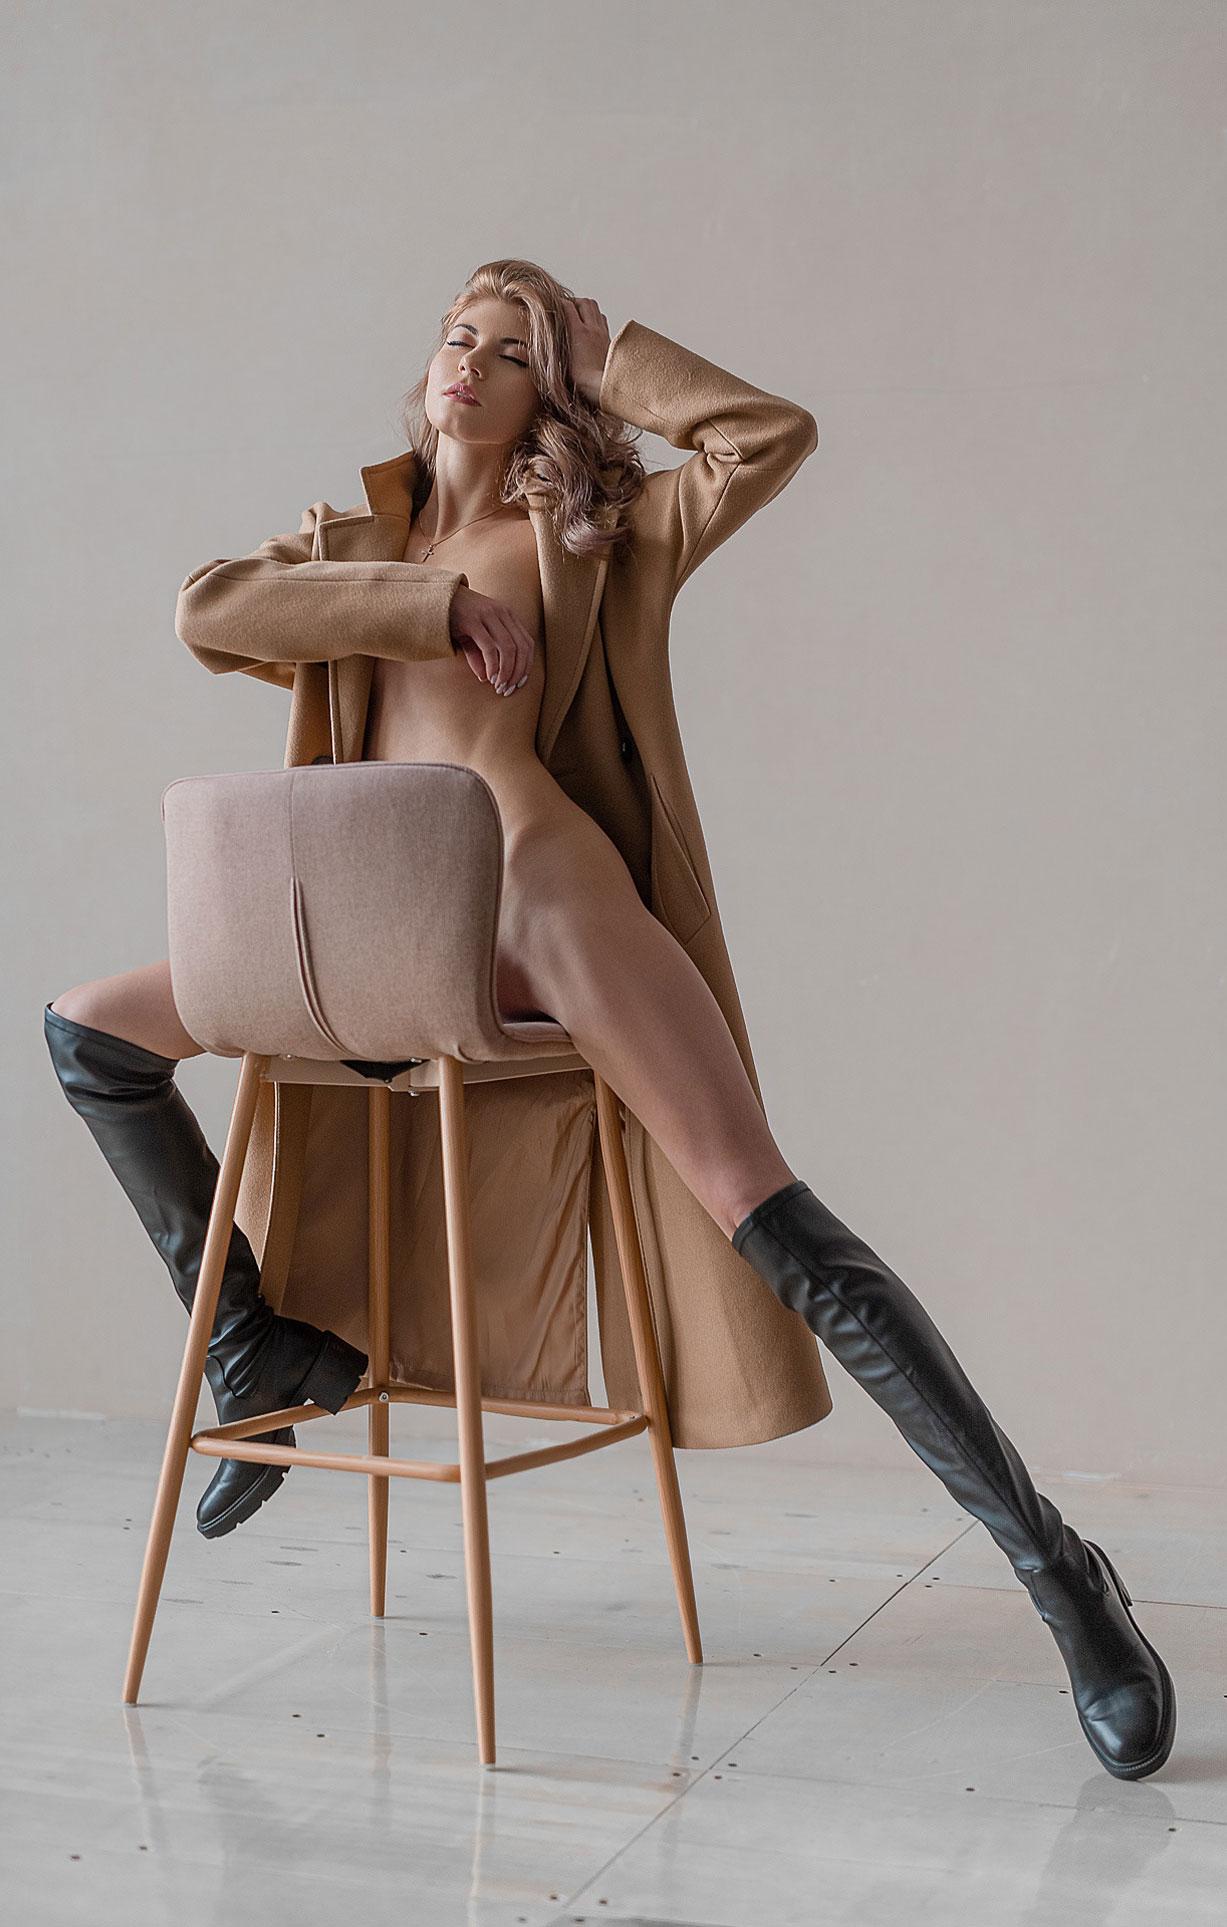 Тэш в сапогах и пальто на голое тело / фото 08